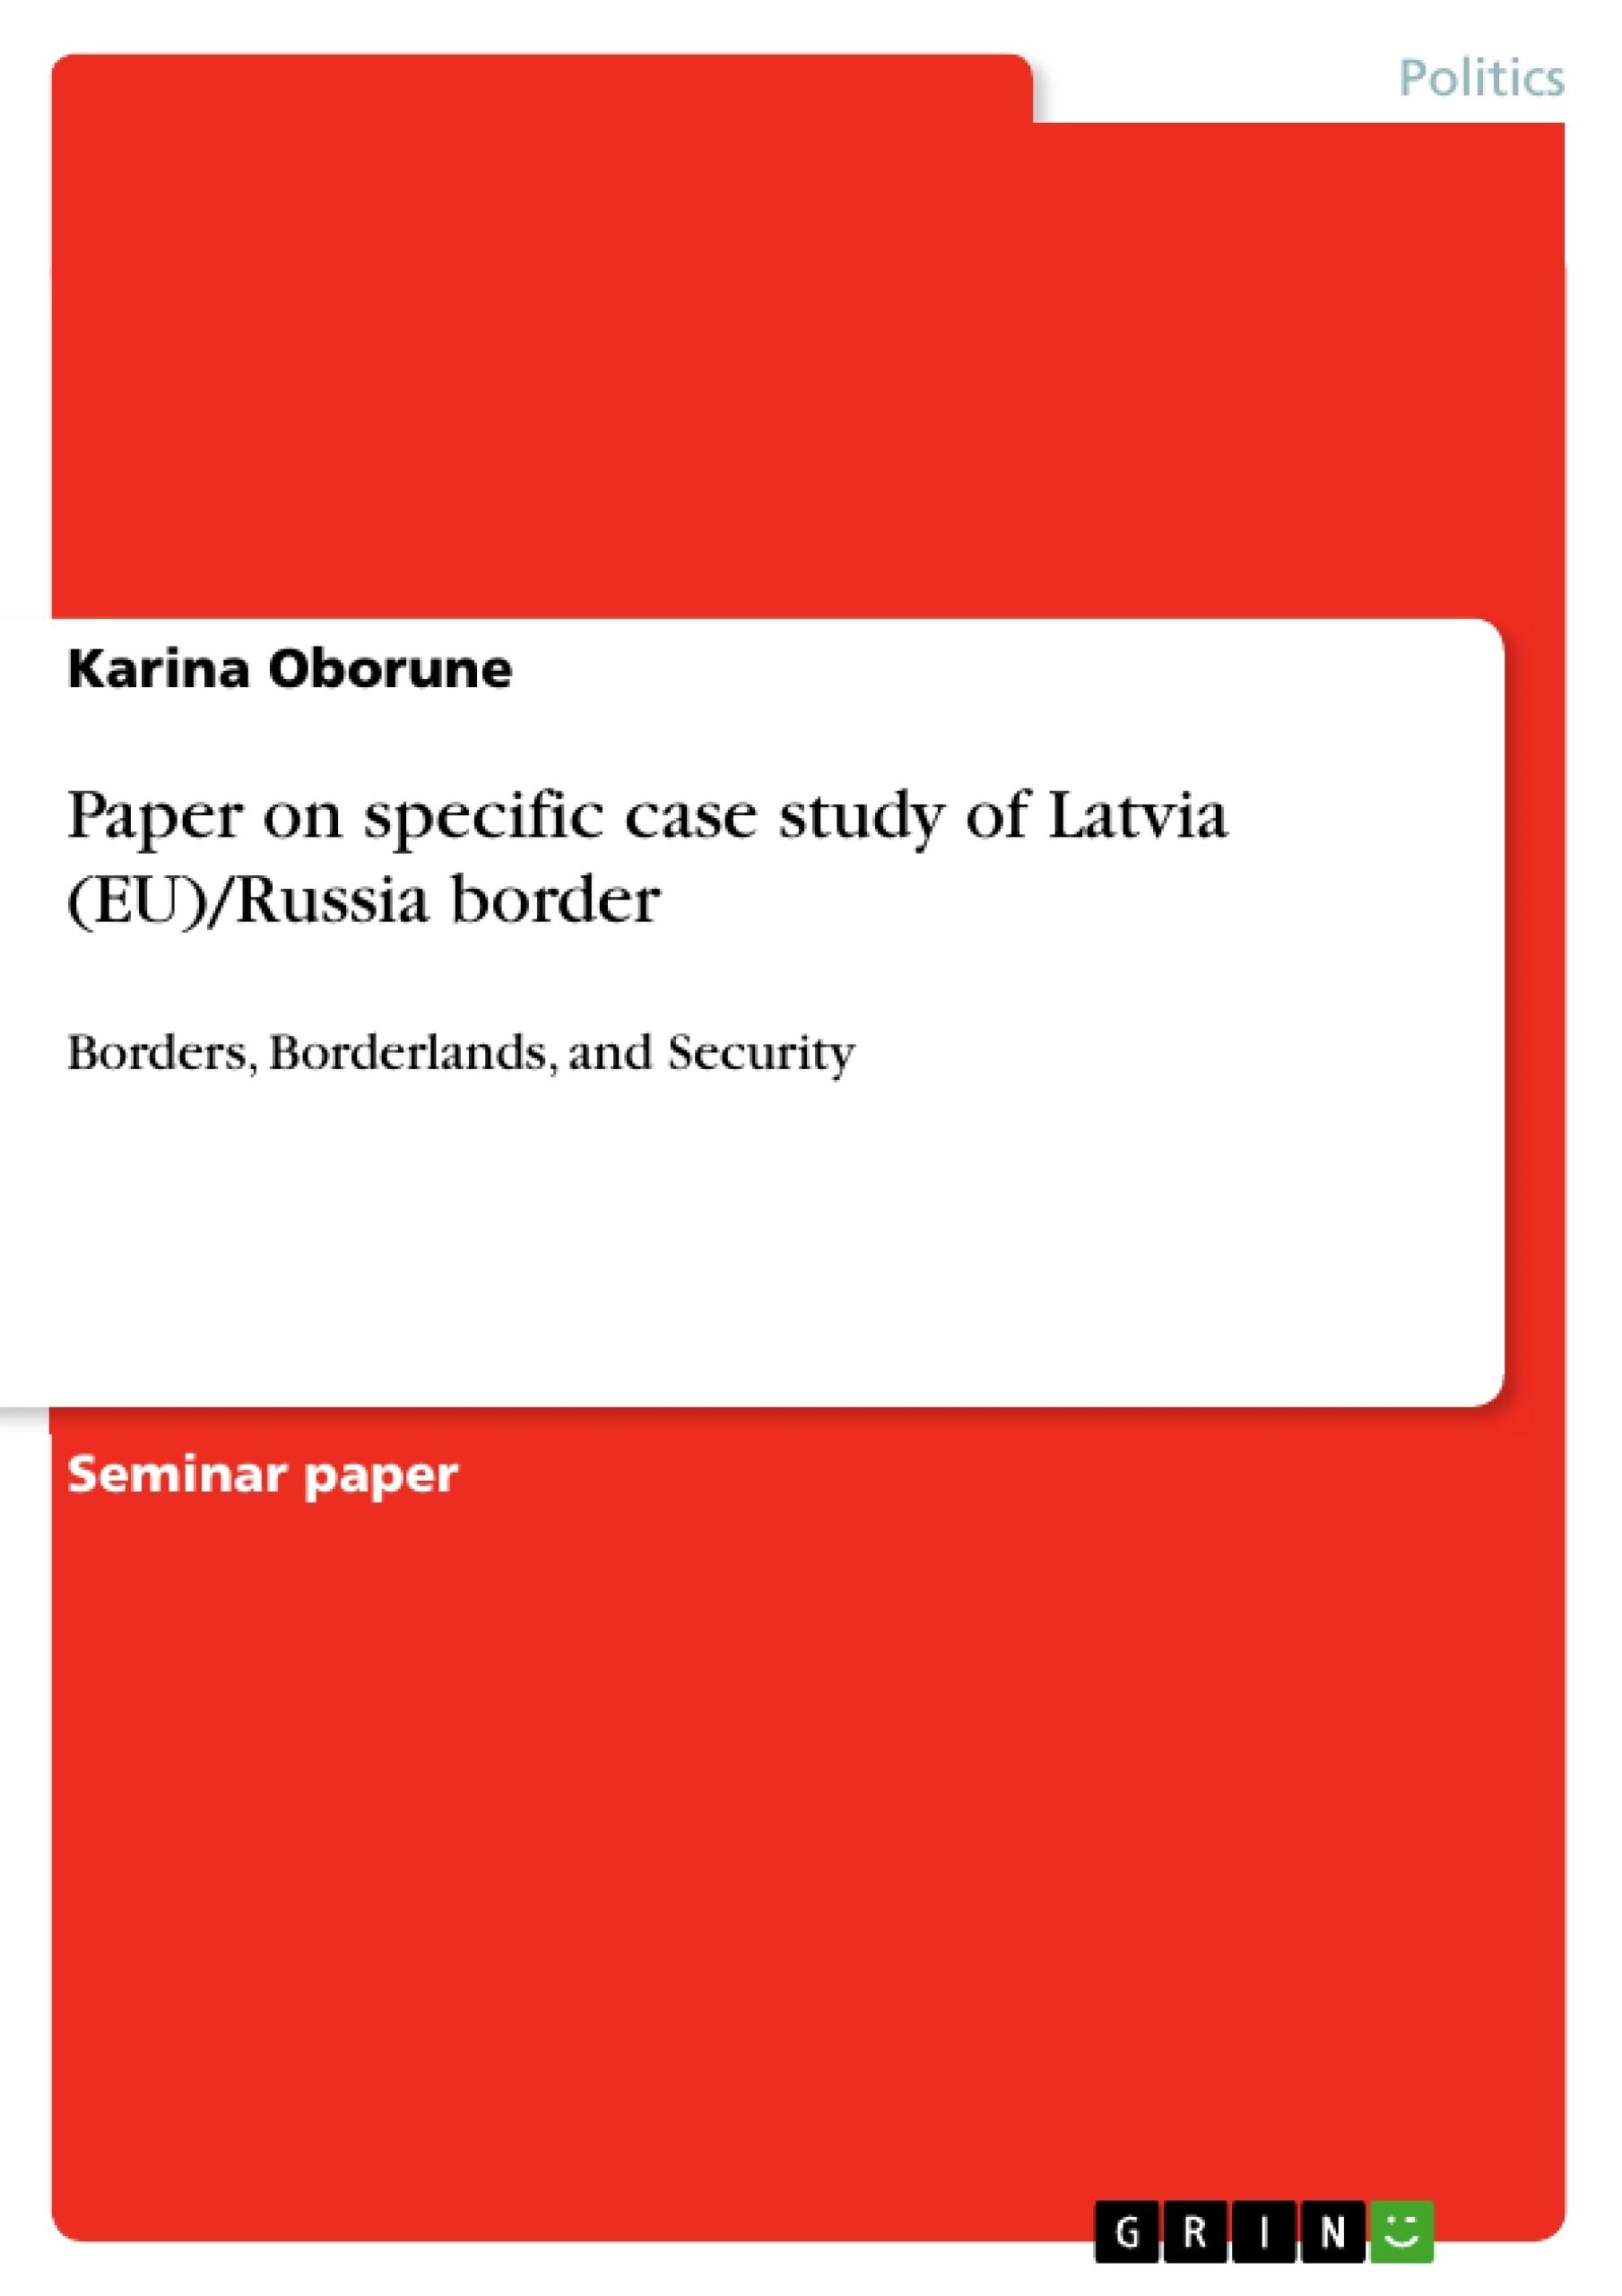 Title: Paper on specific case study of Latvia (EU)/Russia border